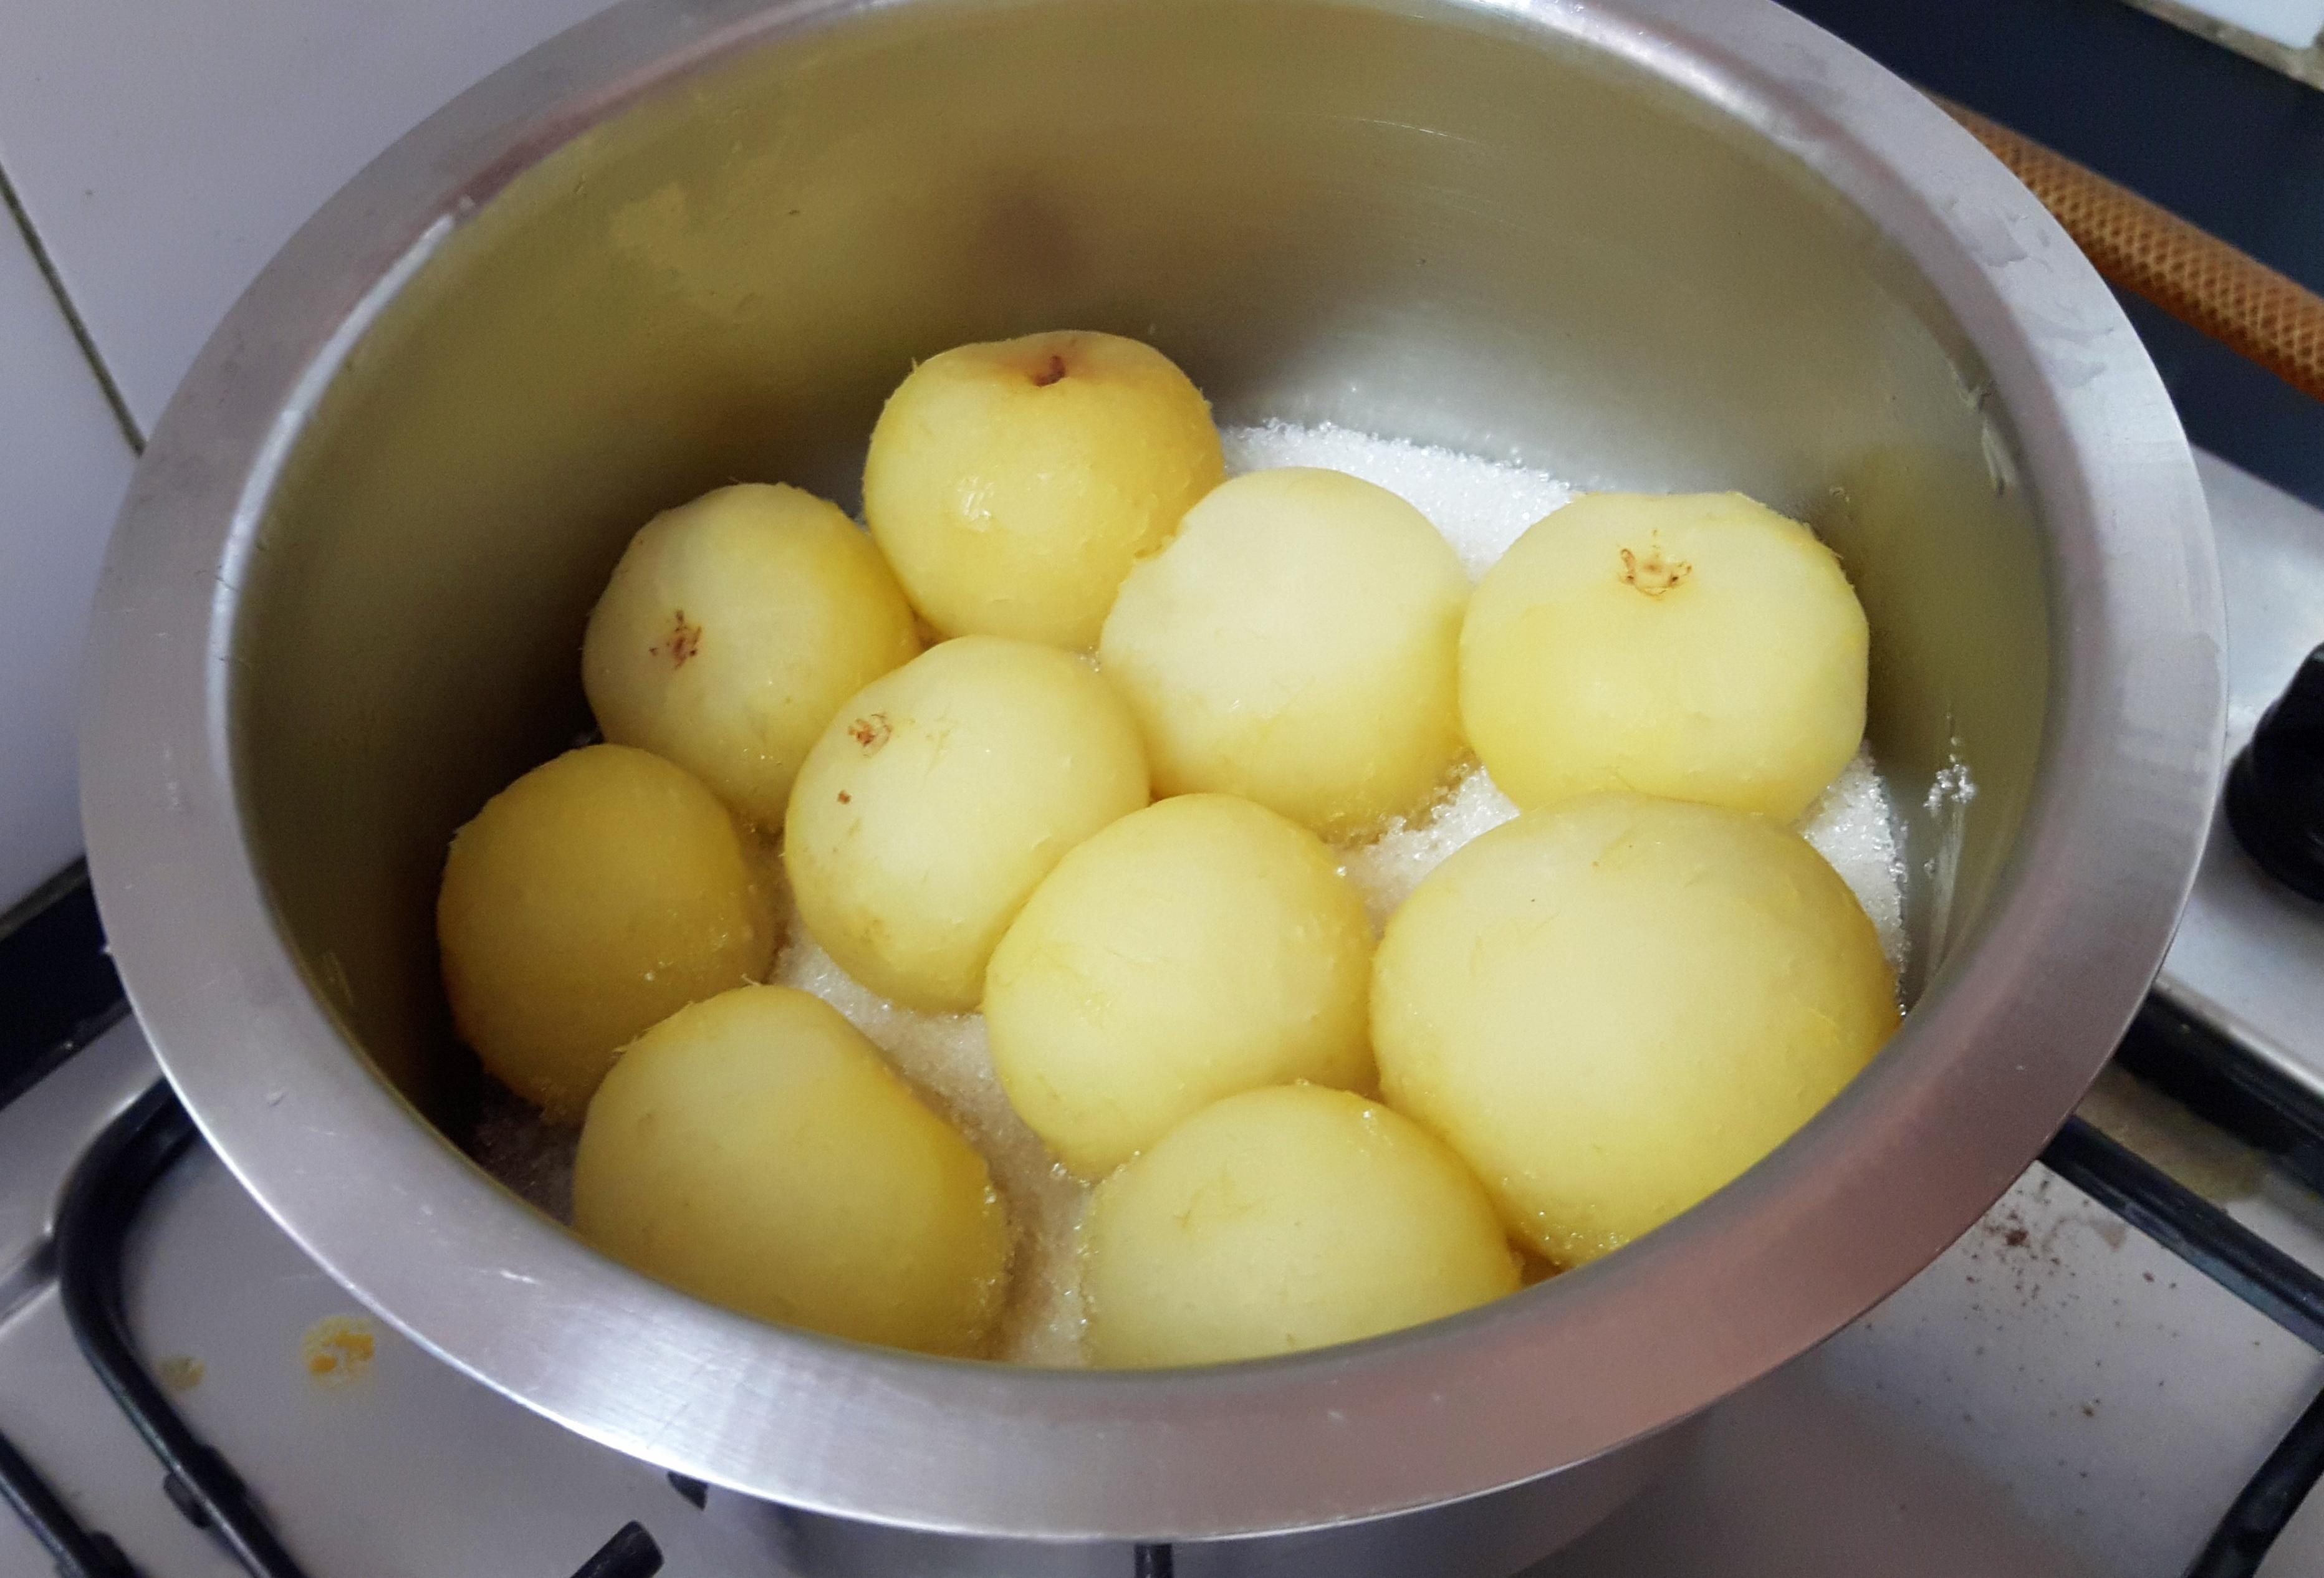 put half quantity of sugar then layer the anwala